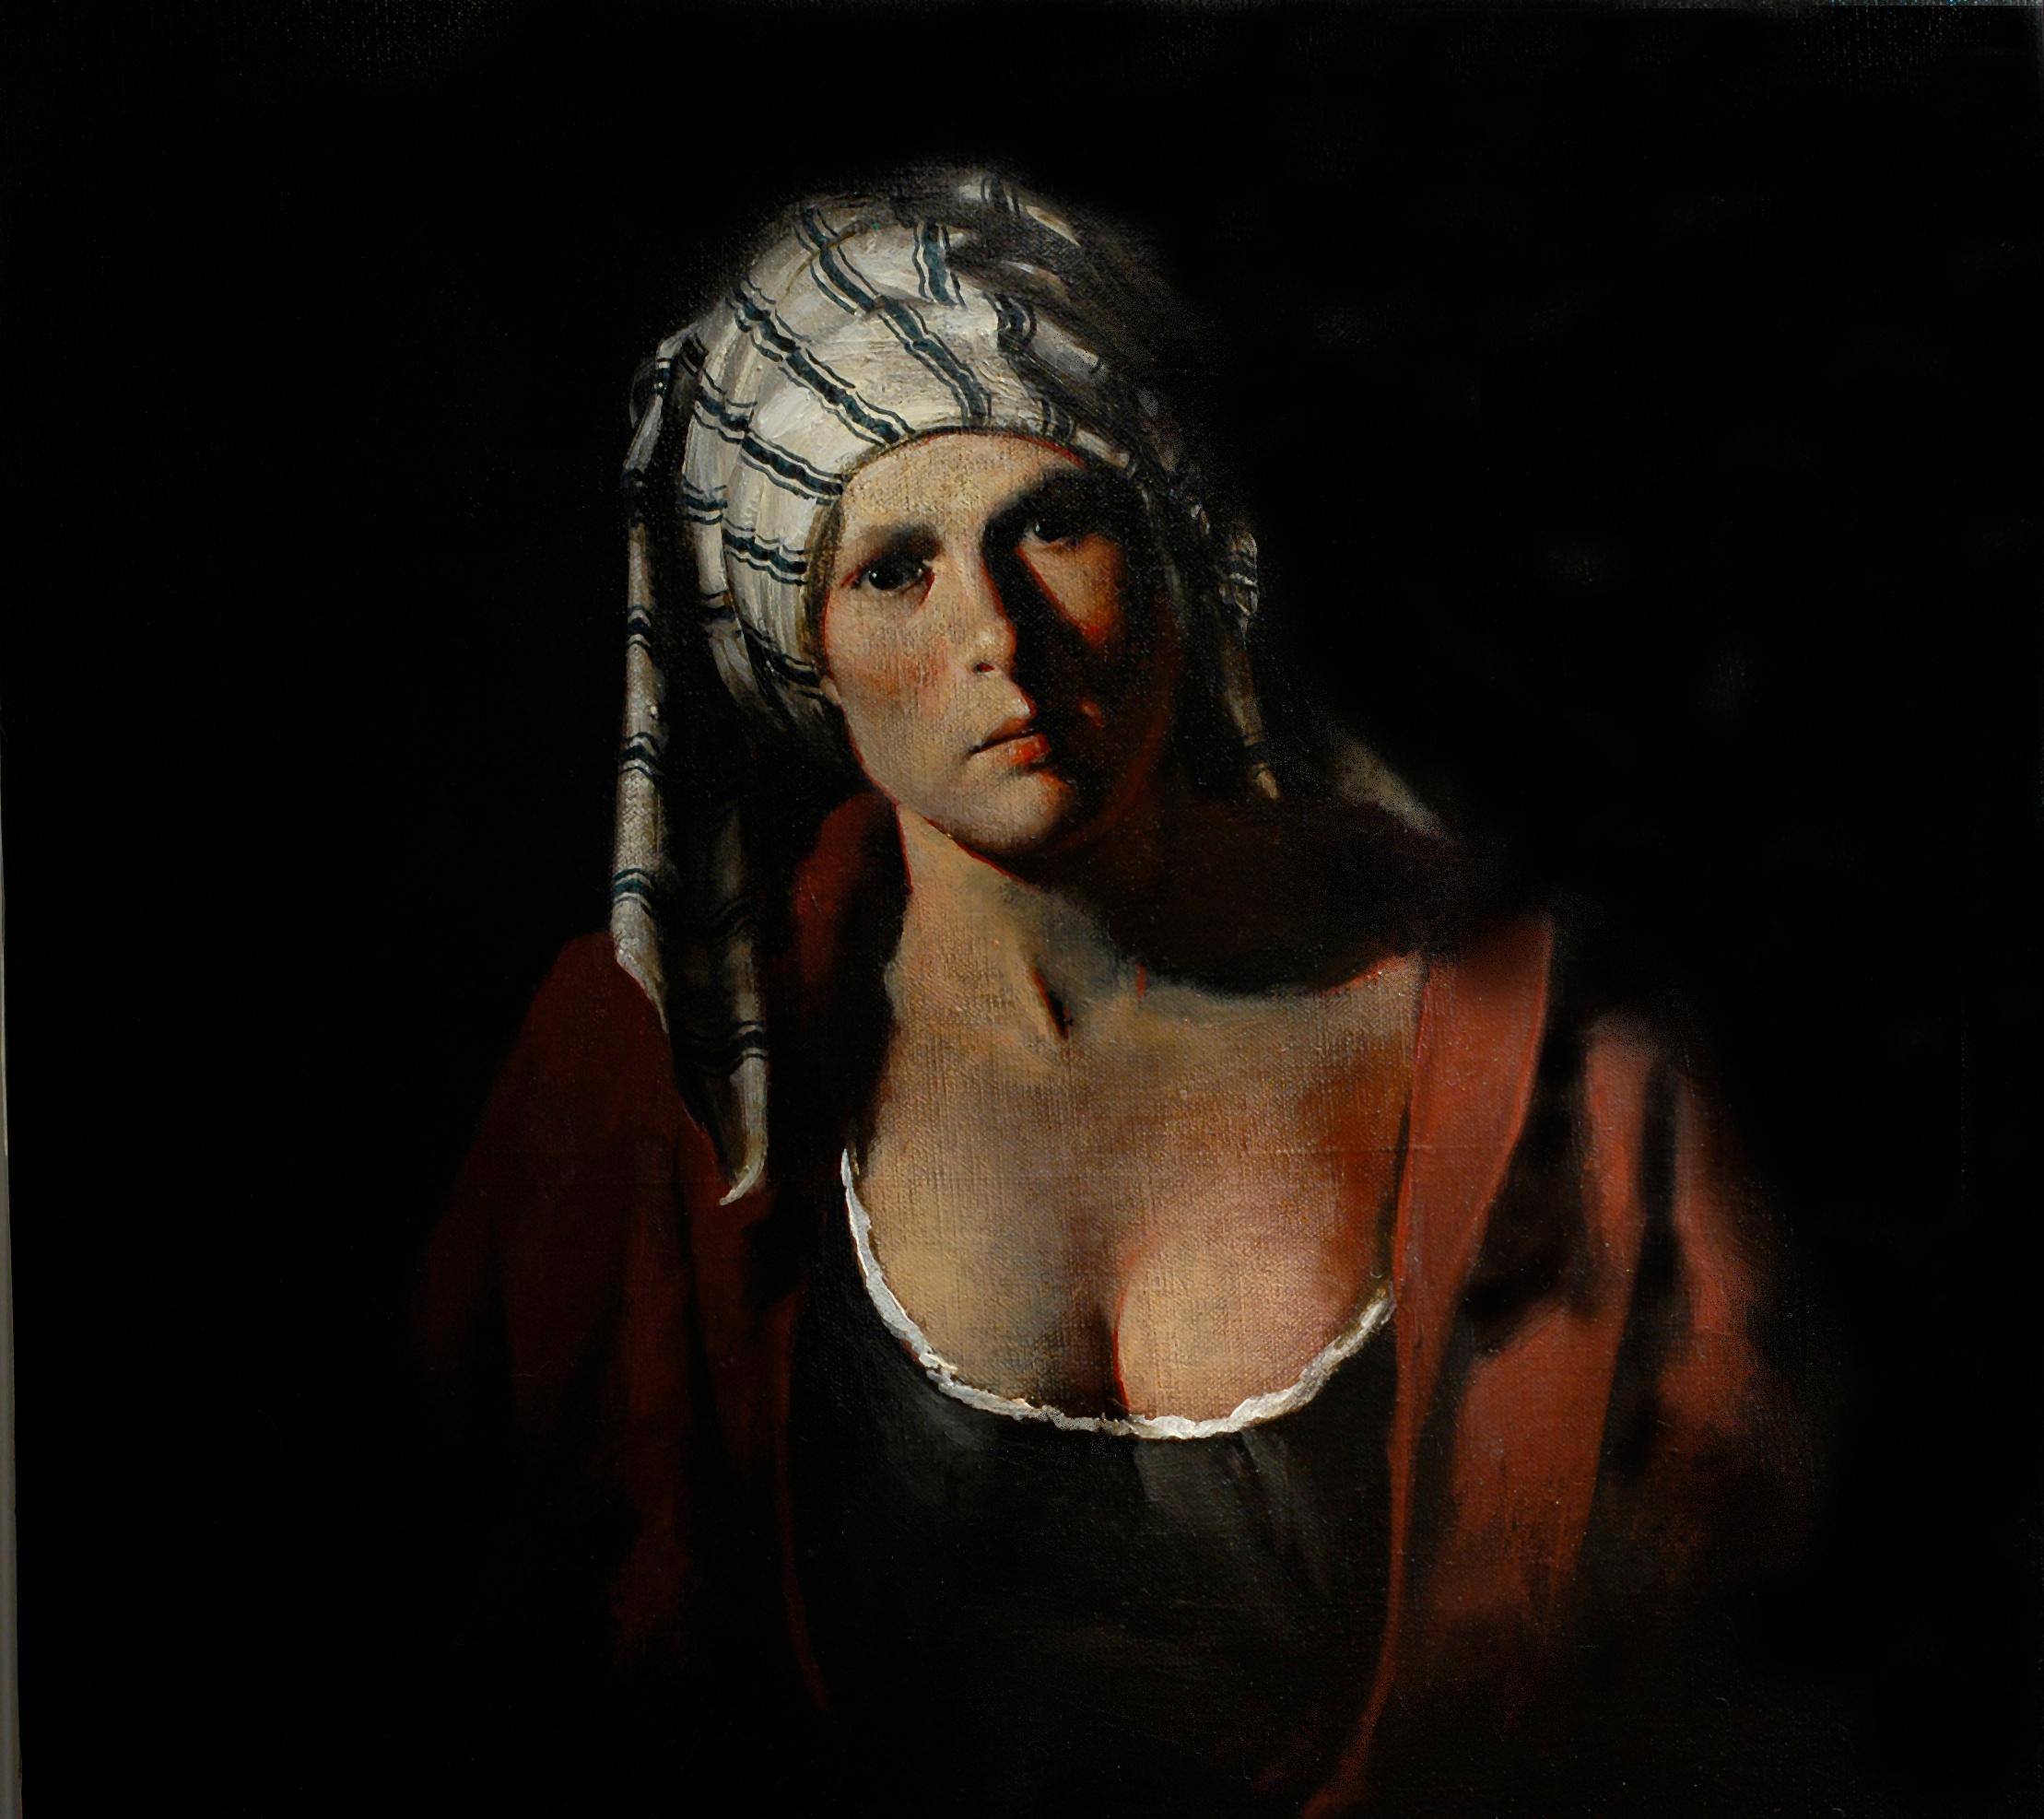 Striped Cap,  Portrait, Figurative, Baroque, Female, Oil, Painting, Timeless